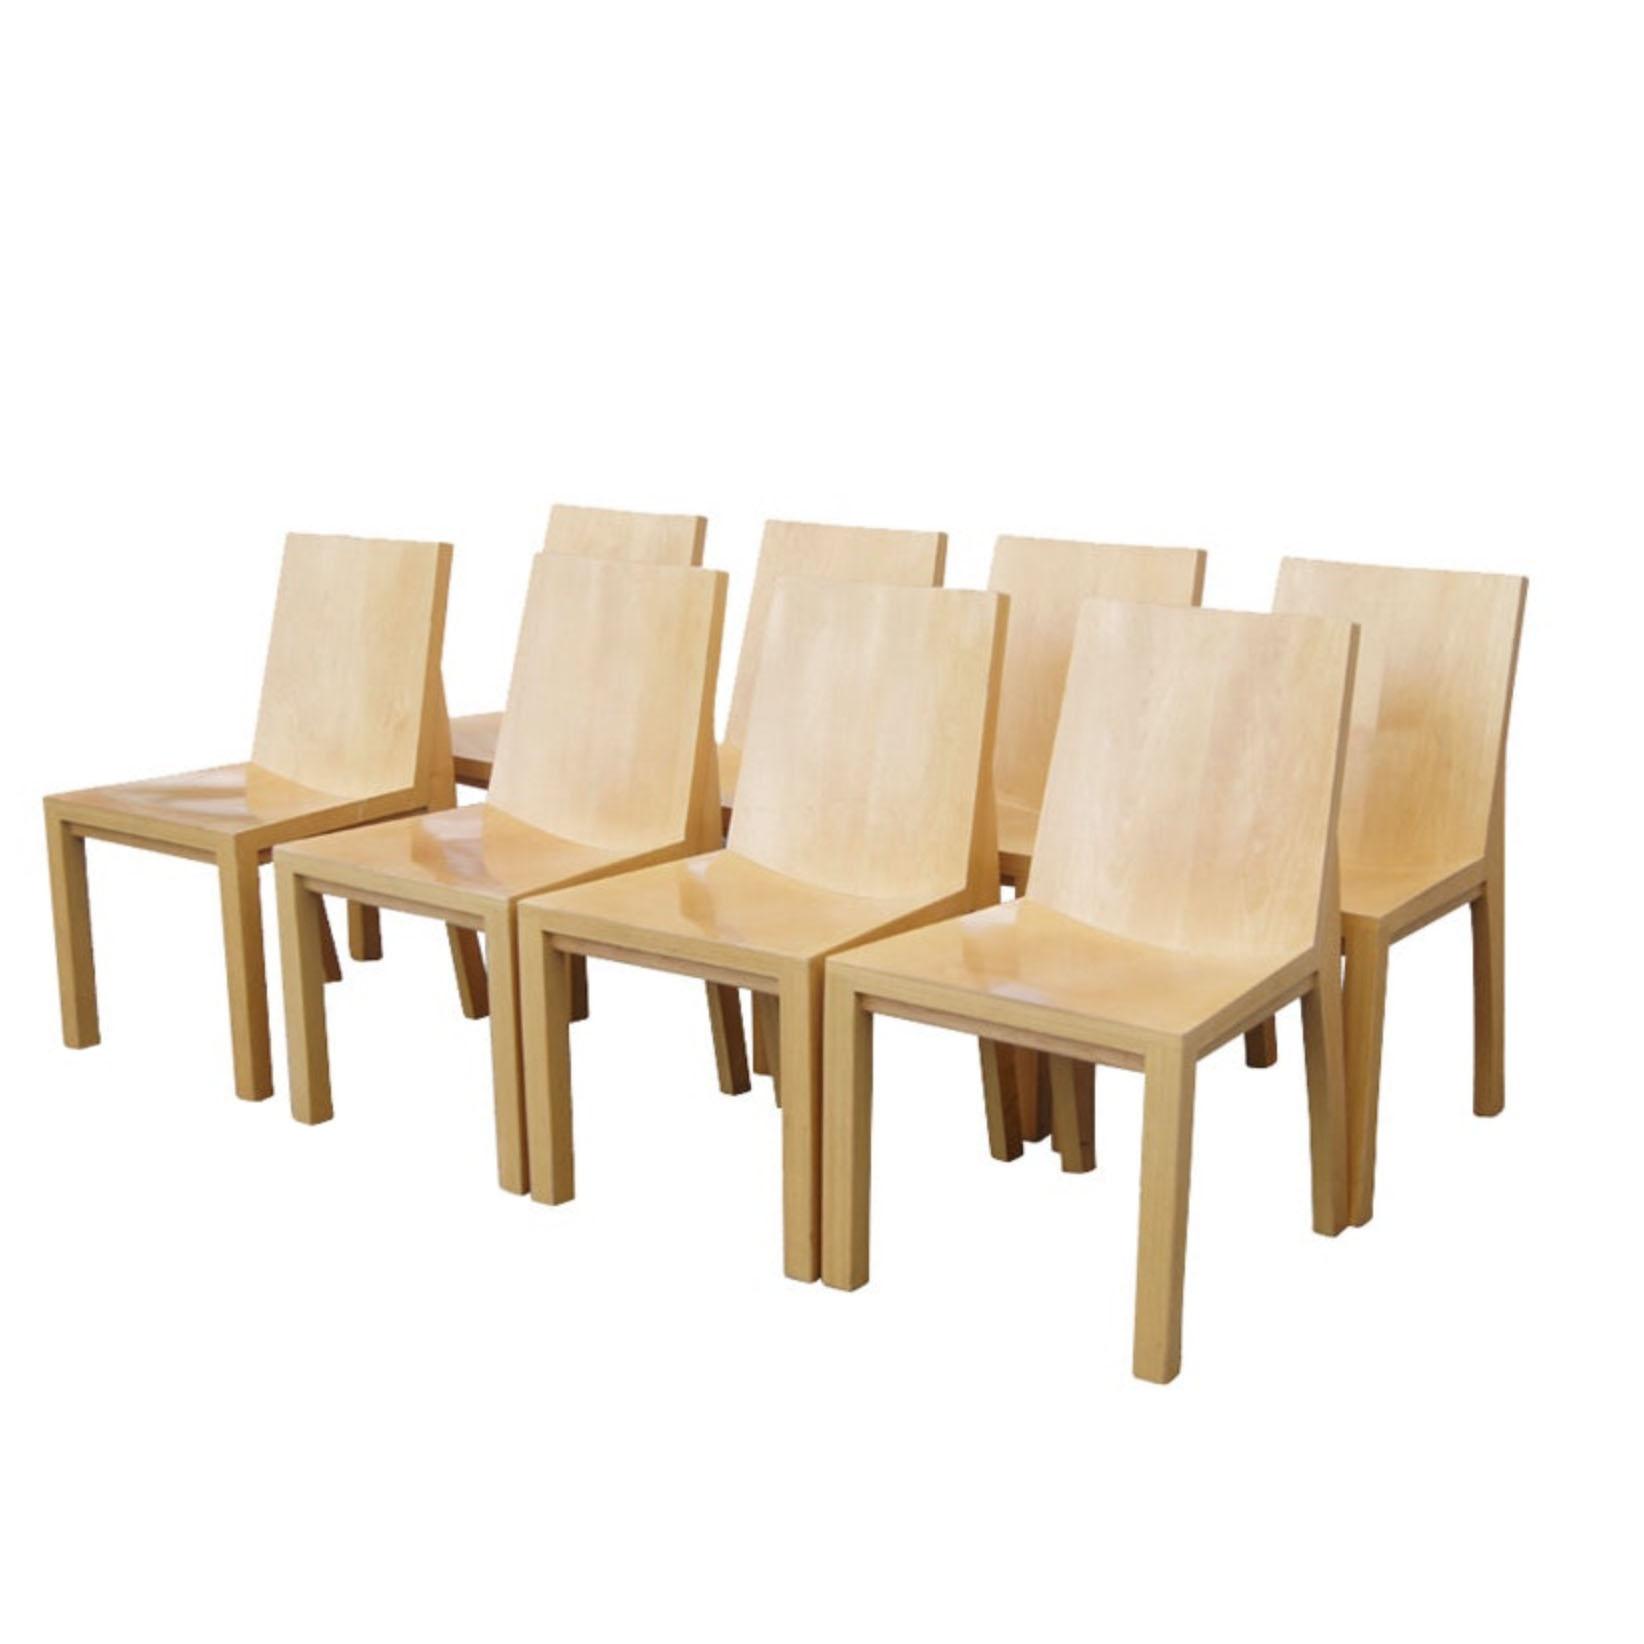 19100713 – Set of 8 Library Chairs Dakota Jackson – 20